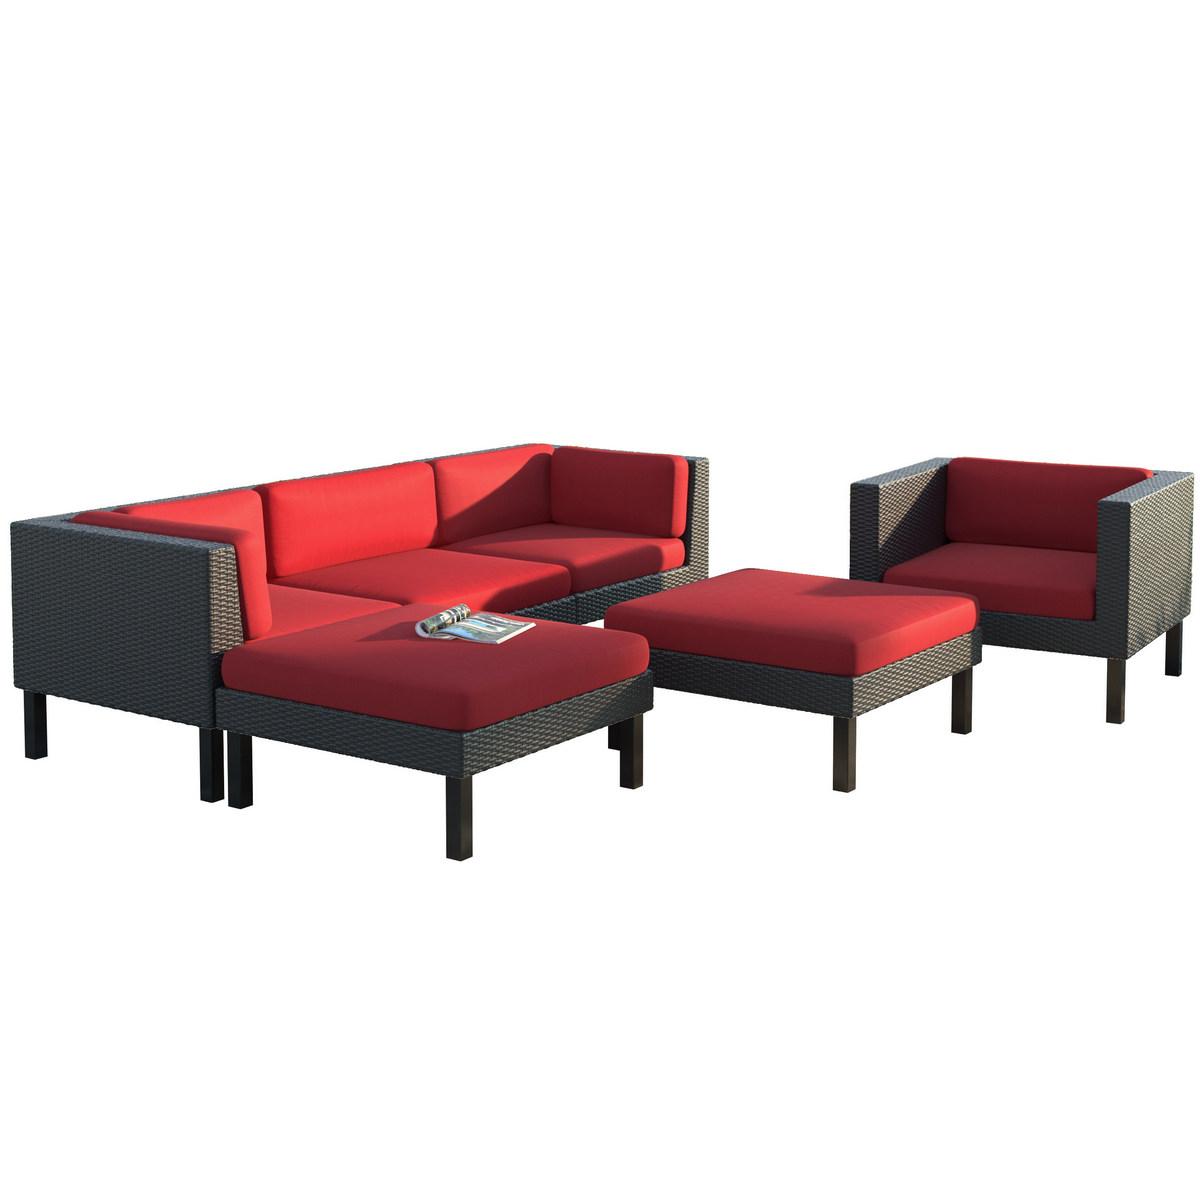 Sofa Chaise Lounge Chair Patio Set